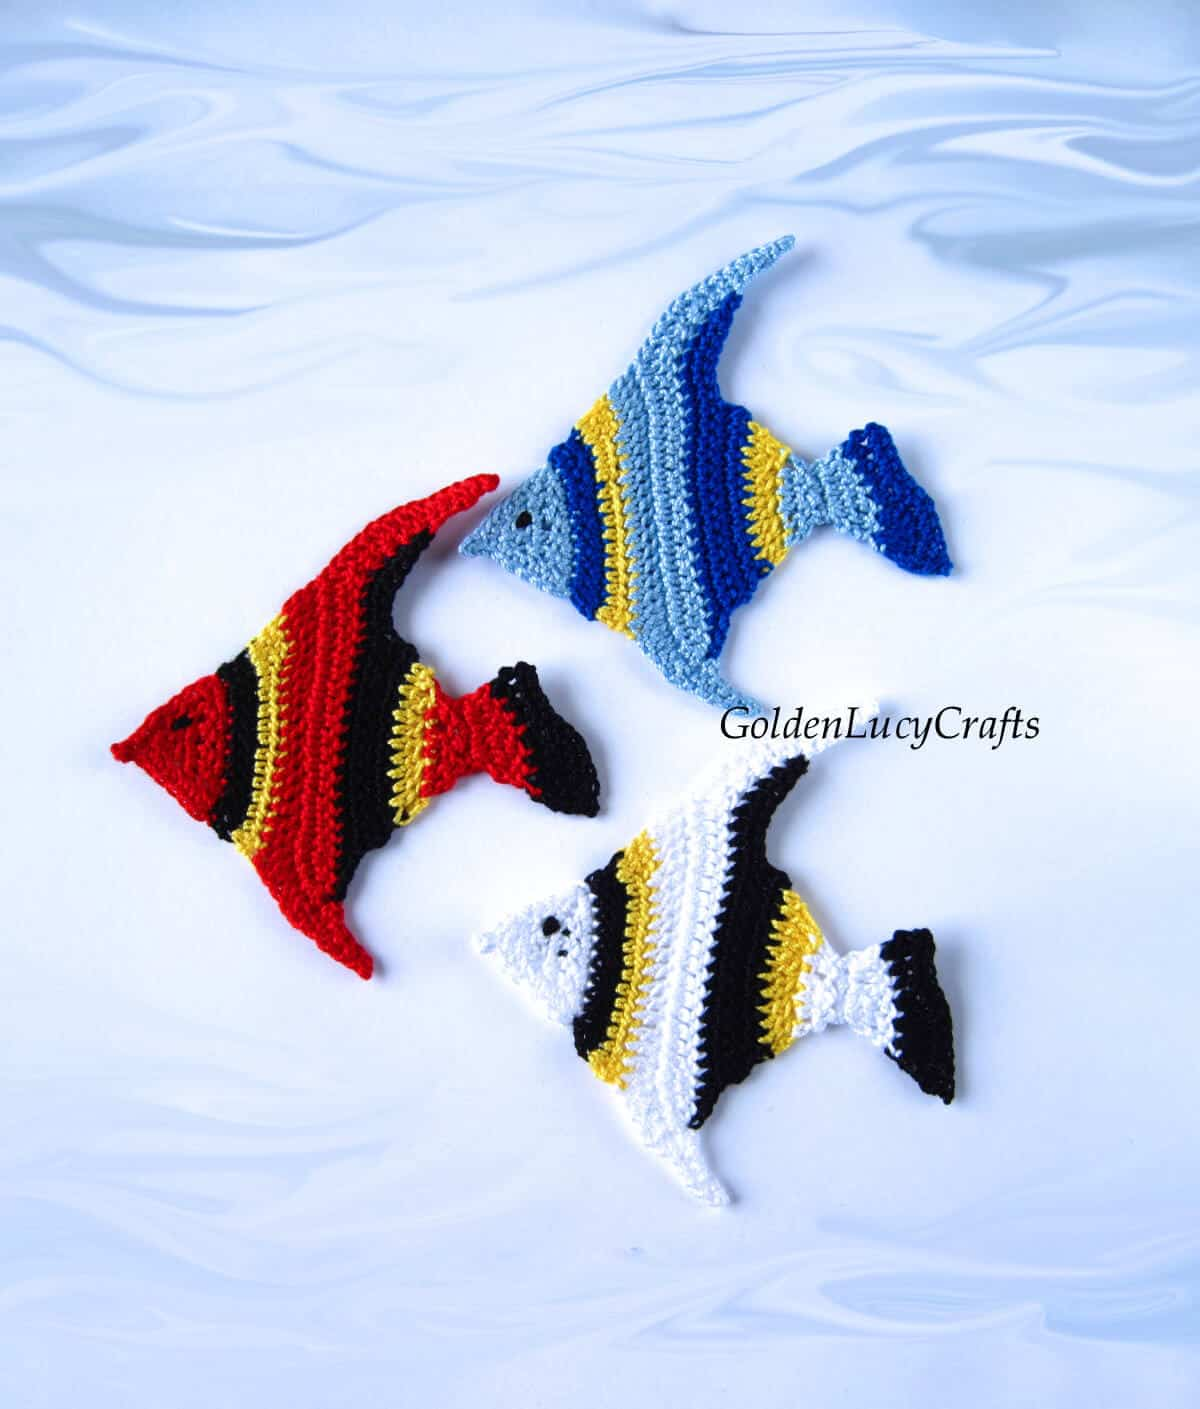 Aplique de tres peces de colores de ganchillo.